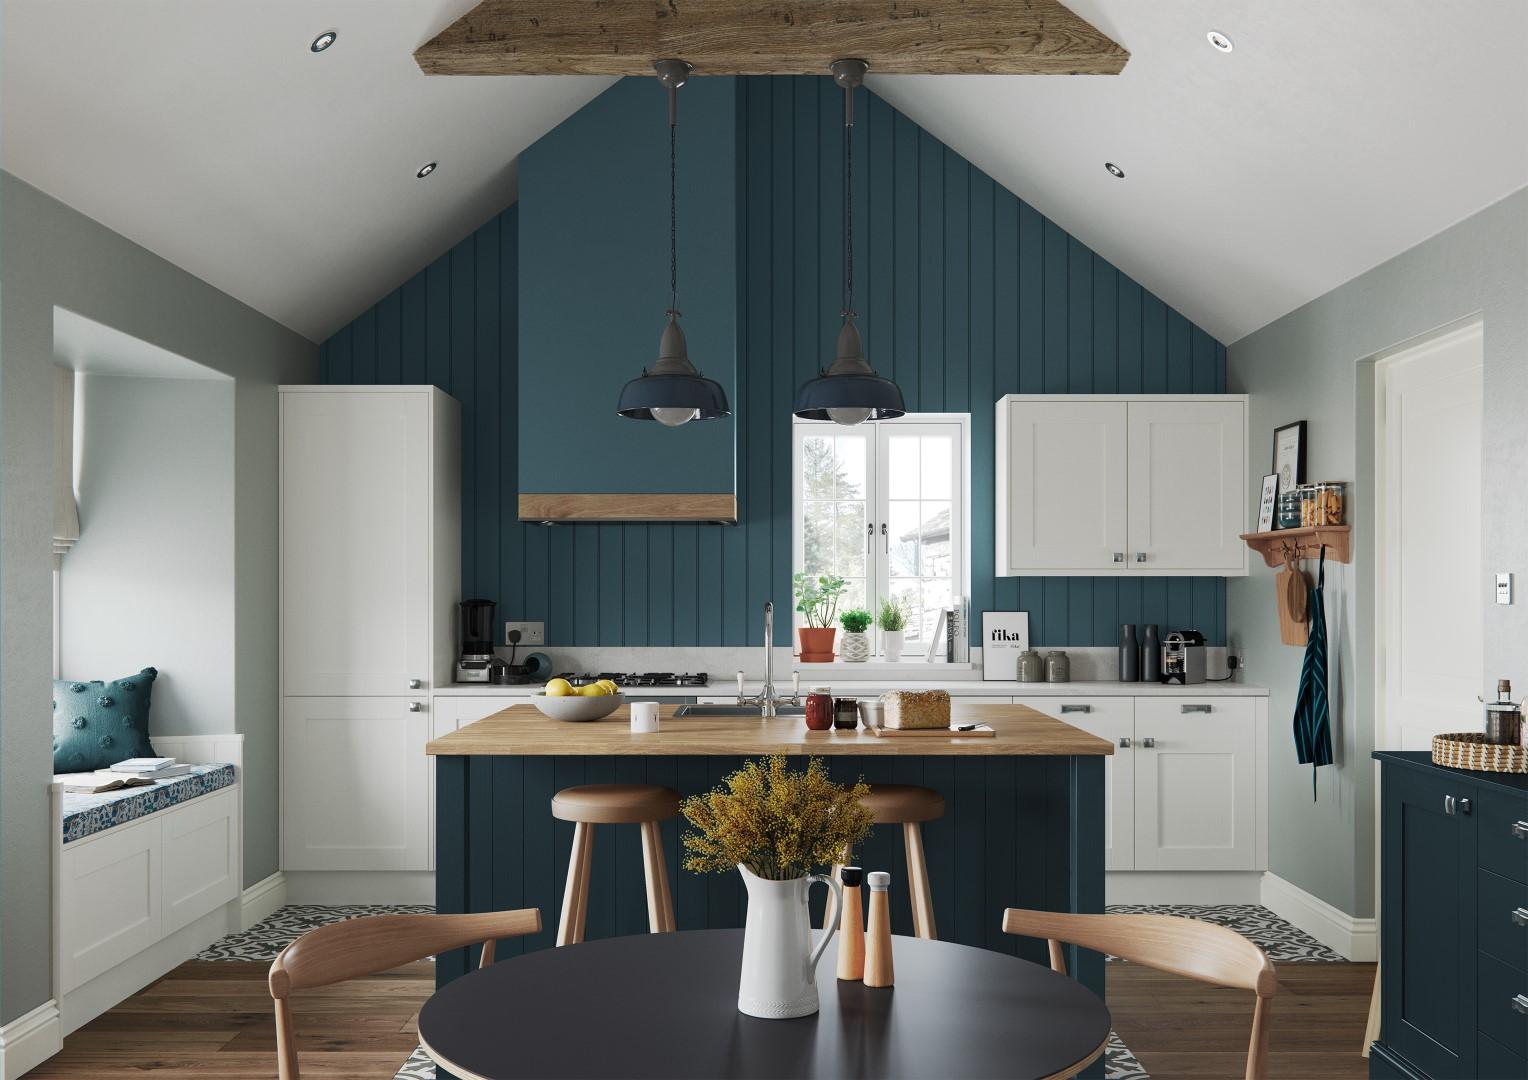 Madison Porcelain and Marine - Kitchen Design - Alan Kelly Kitchens - Waterford - 6